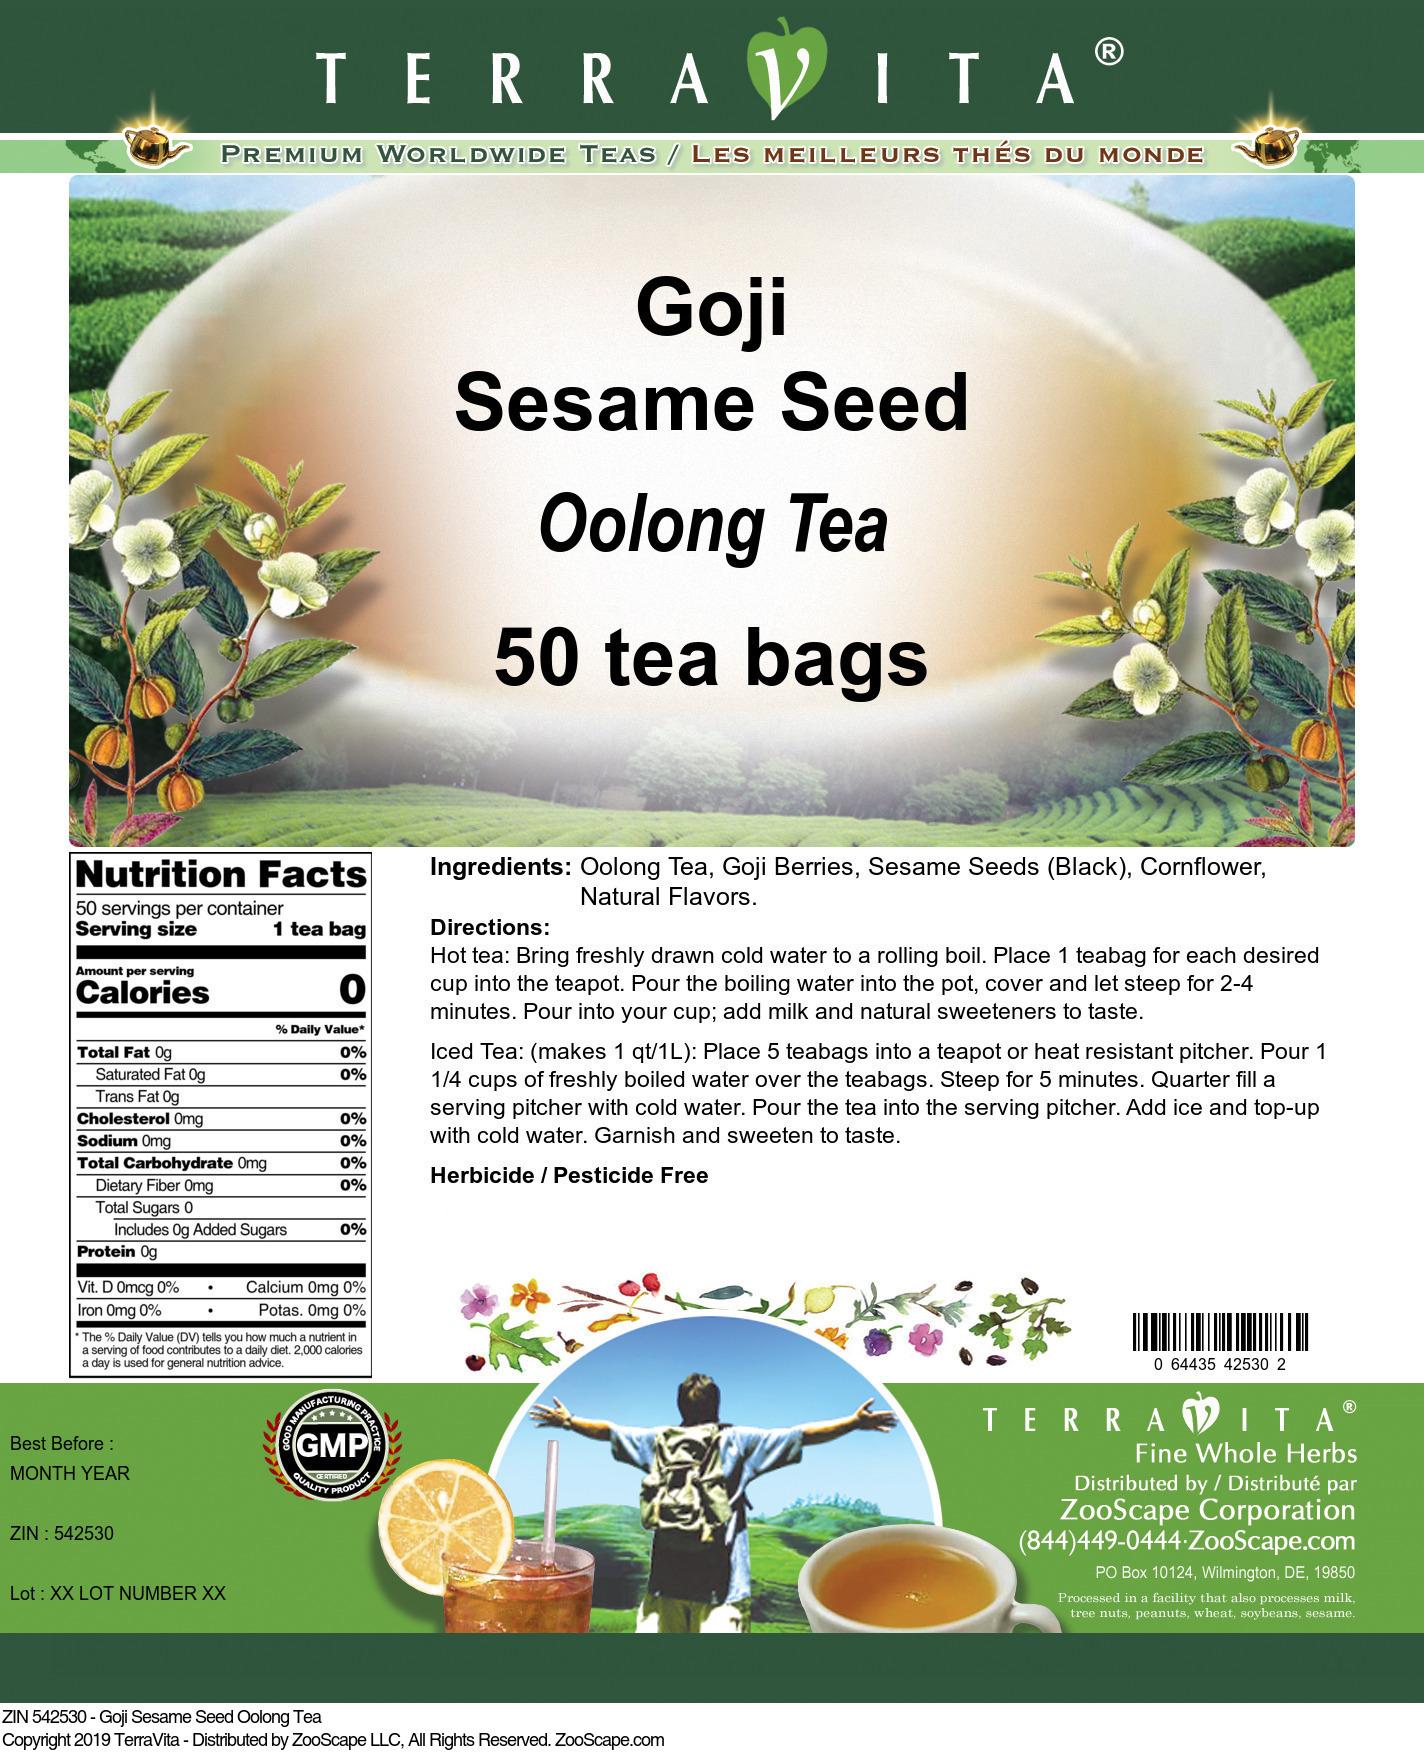 Goji Sesame Seed Oolong Tea